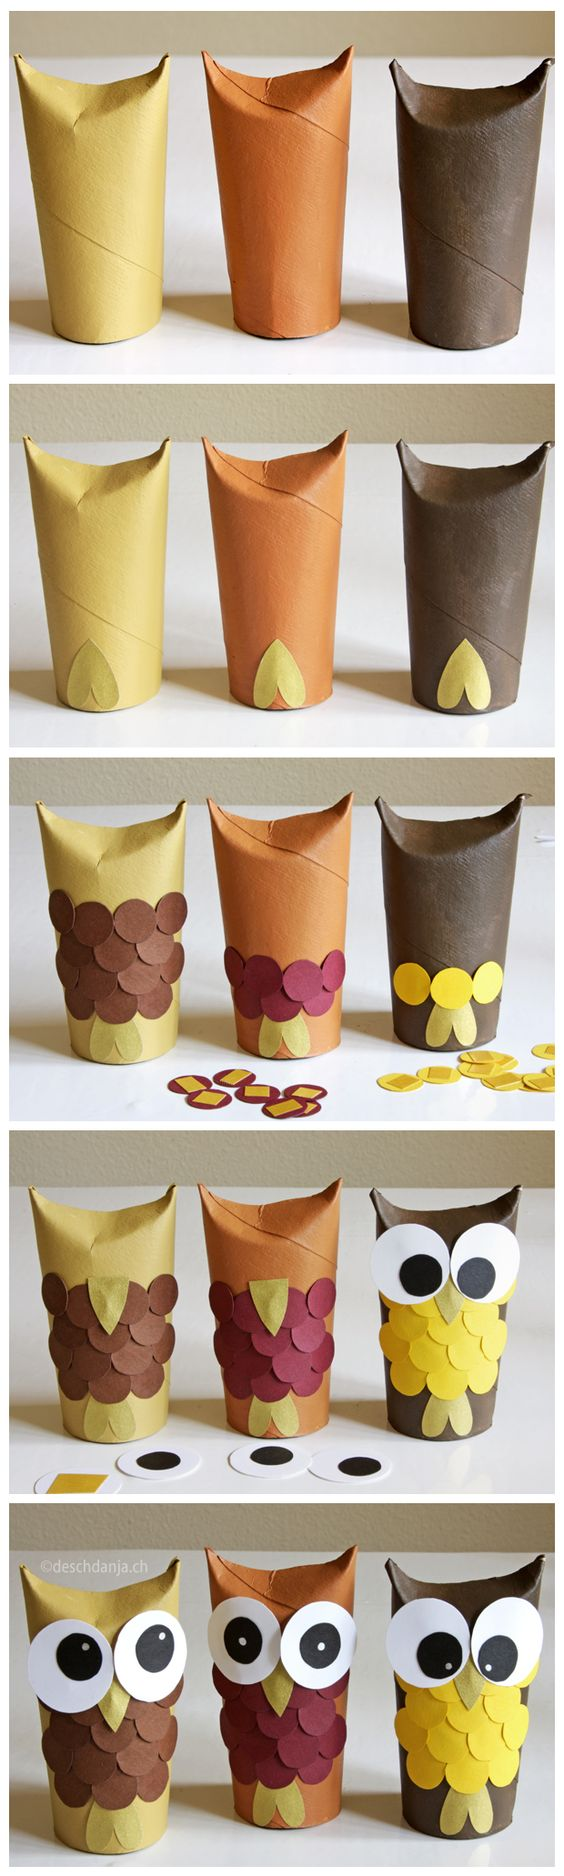 Toilet Paper Rolls Crafts 13